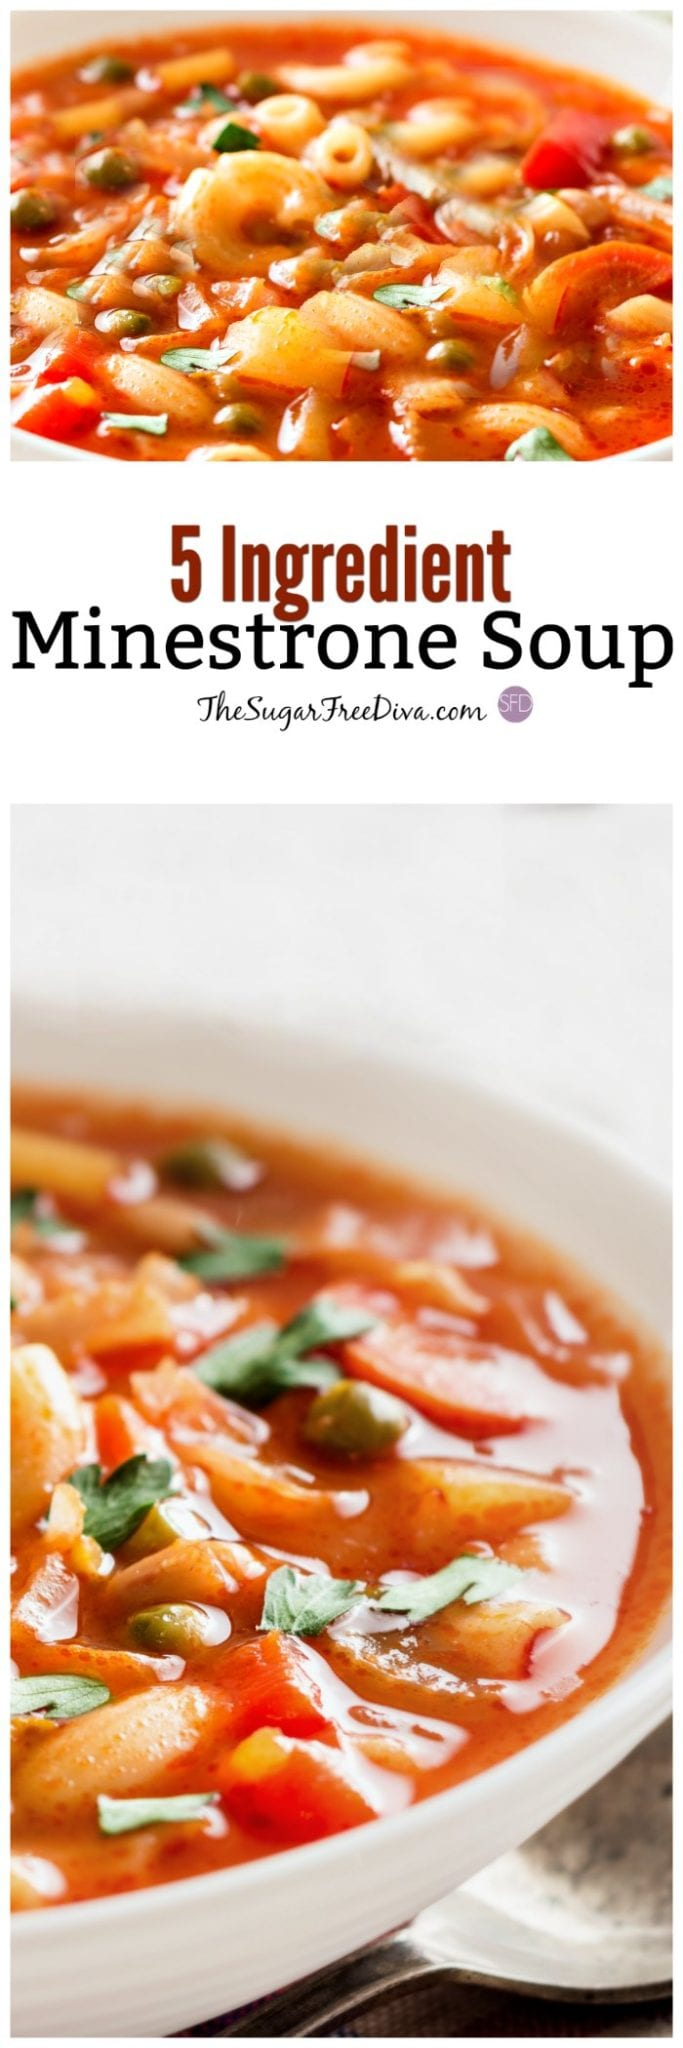 5 Ingredient Minestrone Soup